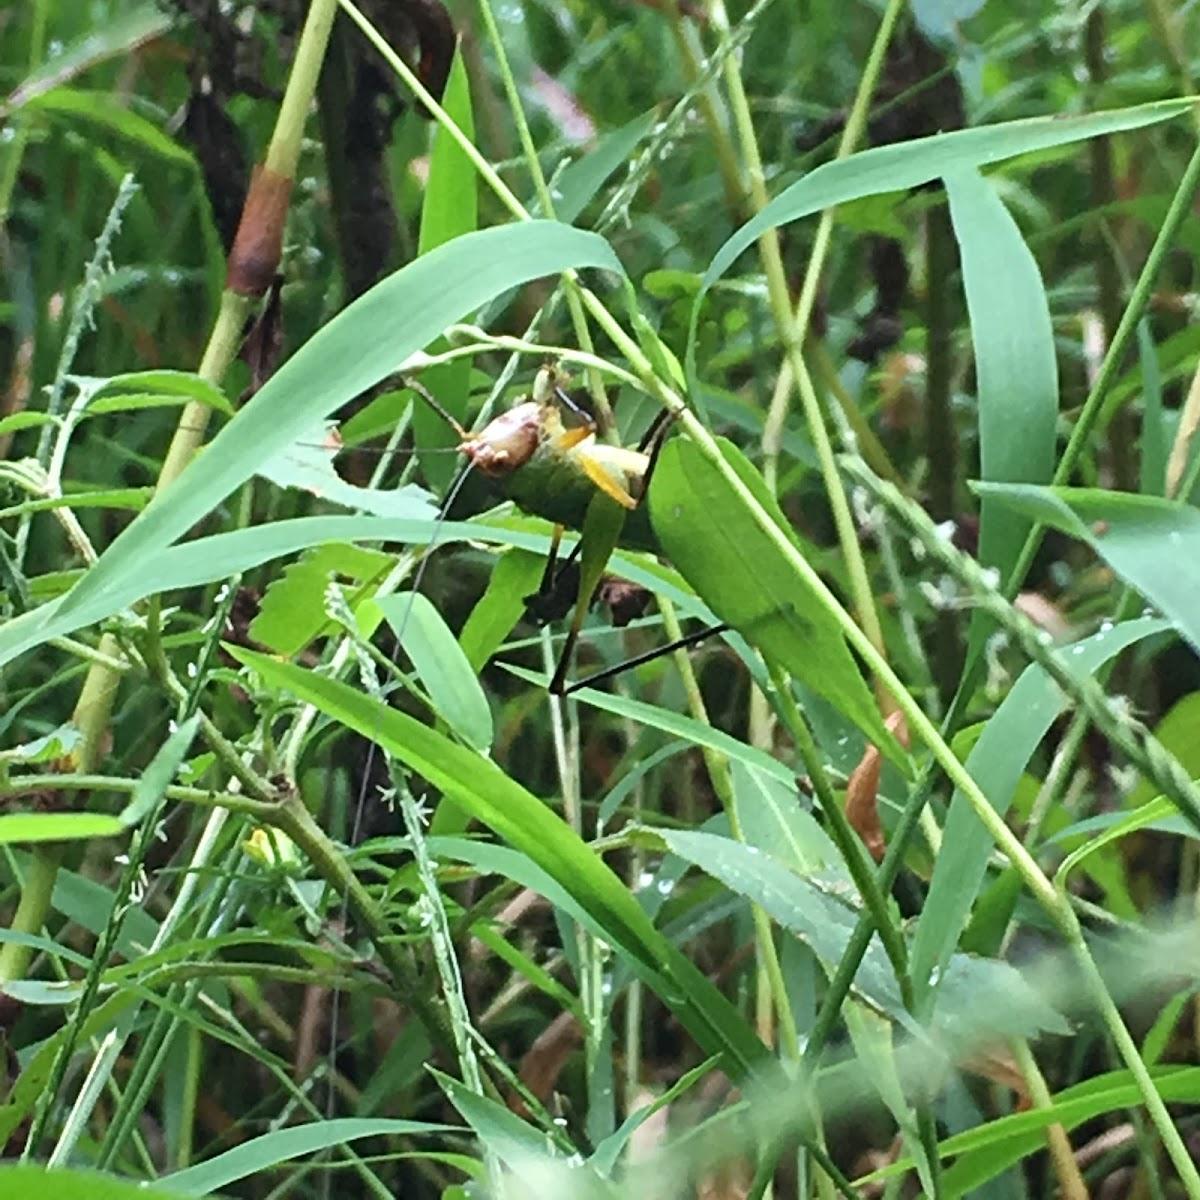 Black-Legged Meadow Katydid